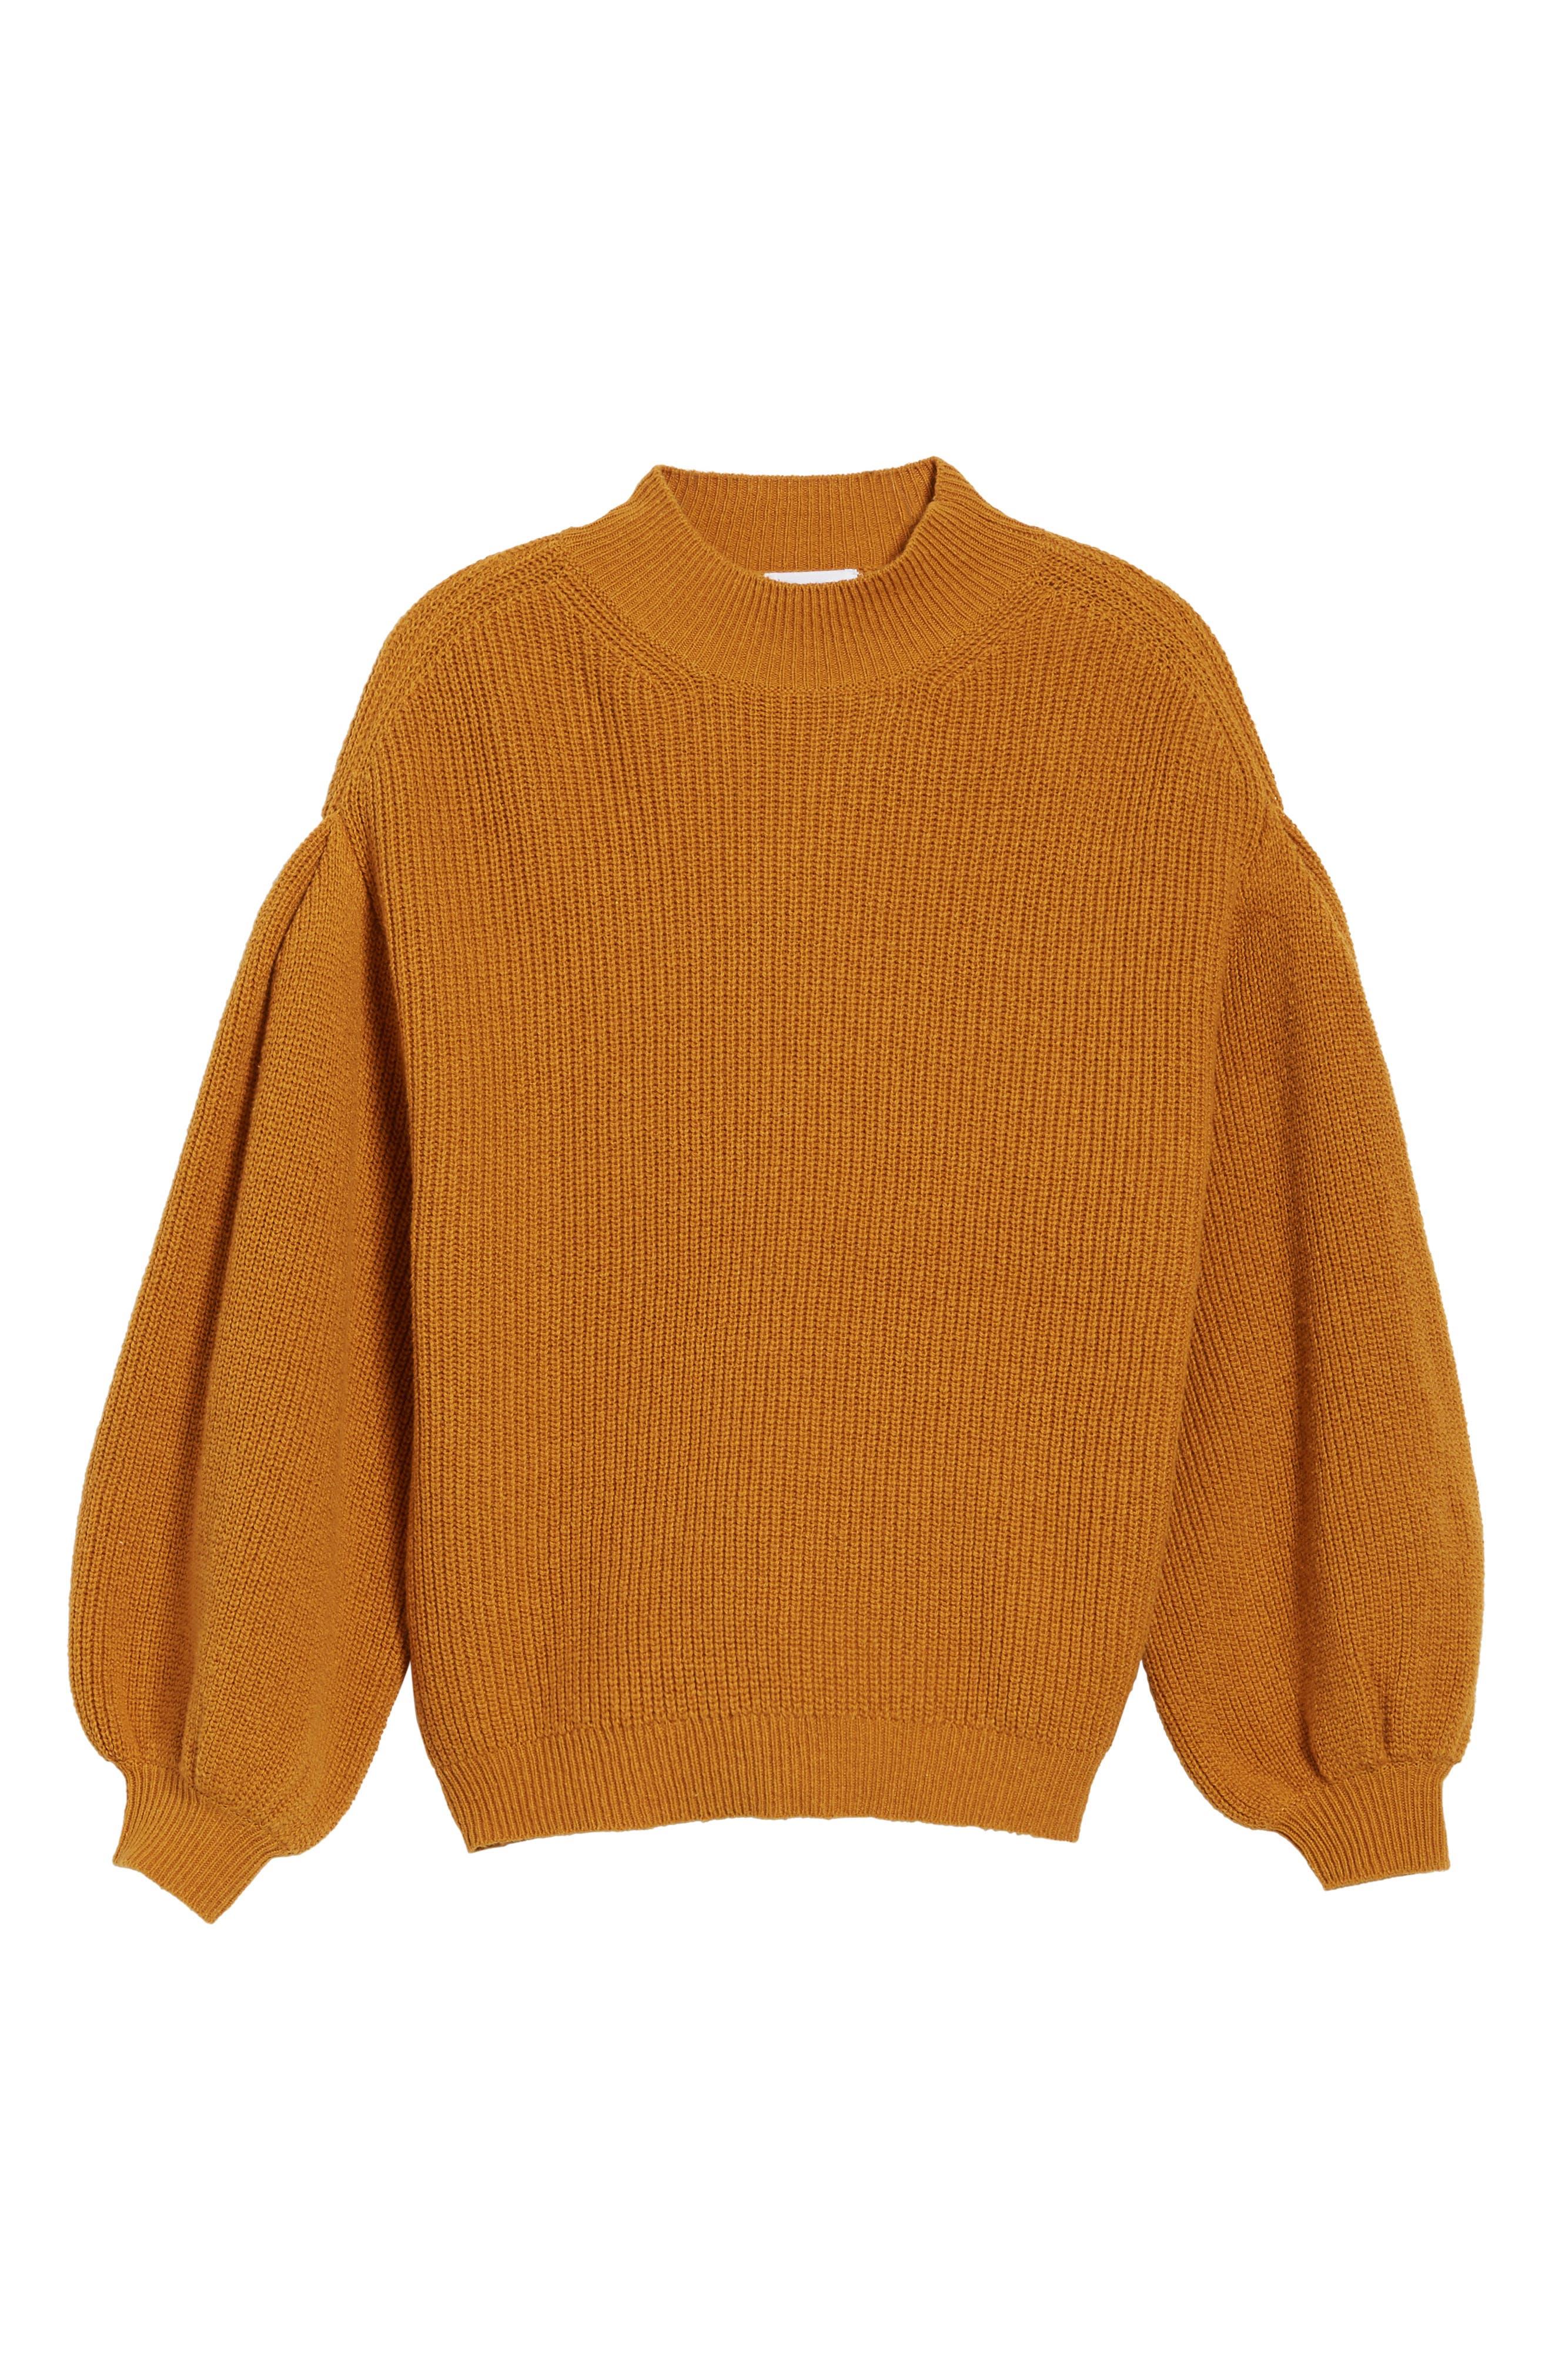 Blouson Sleeve Sweater,                             Alternate thumbnail 27, color,